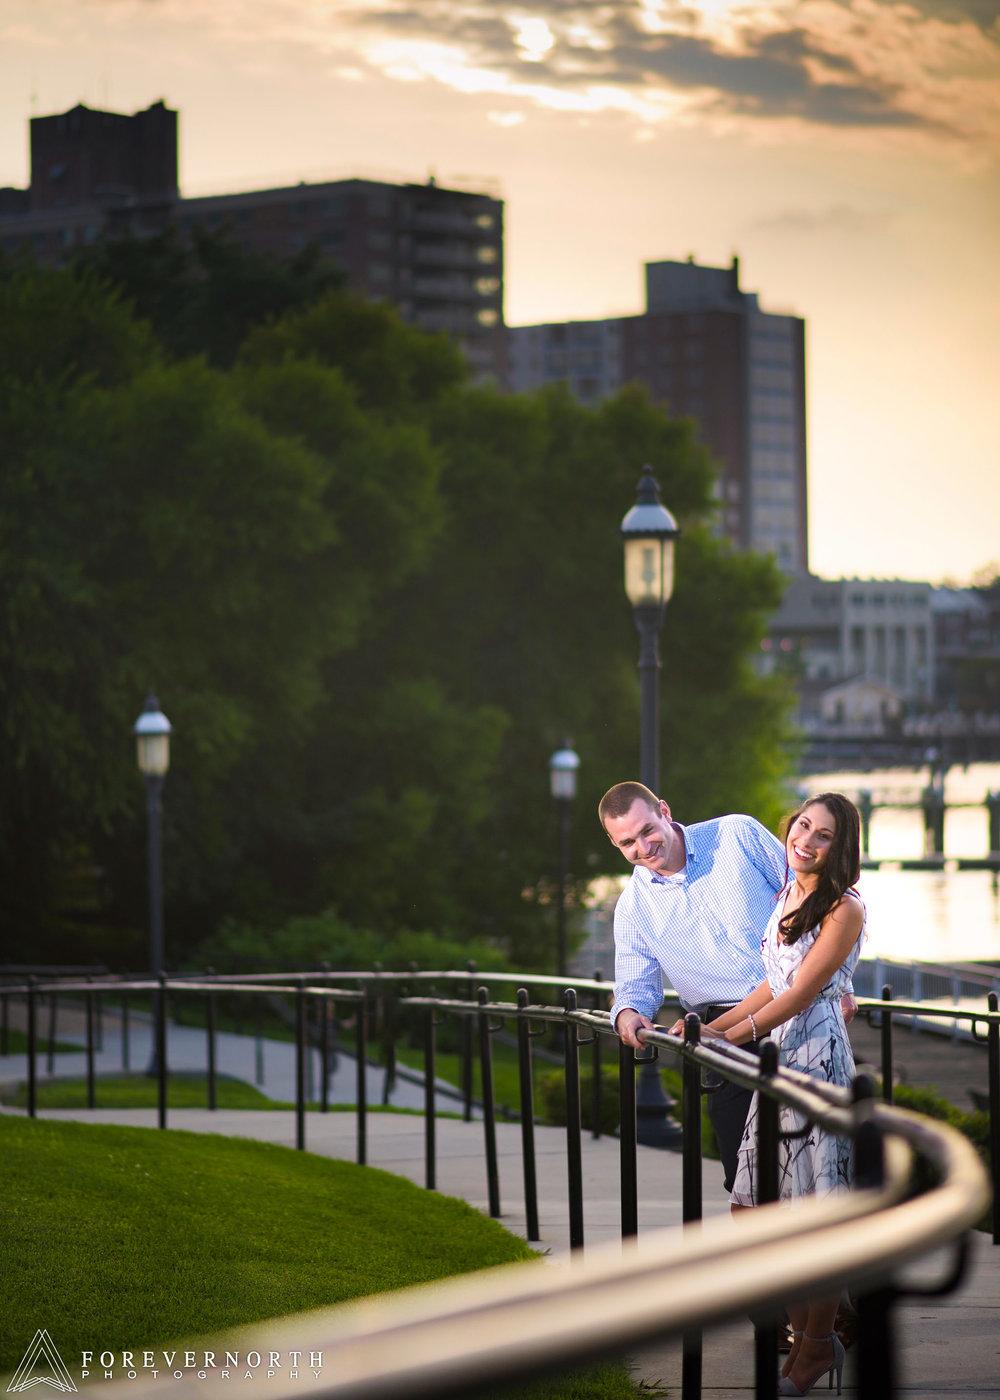 Rob-Joni-Riverside-Gardens-Park-Engagement-Photos-07.JPG